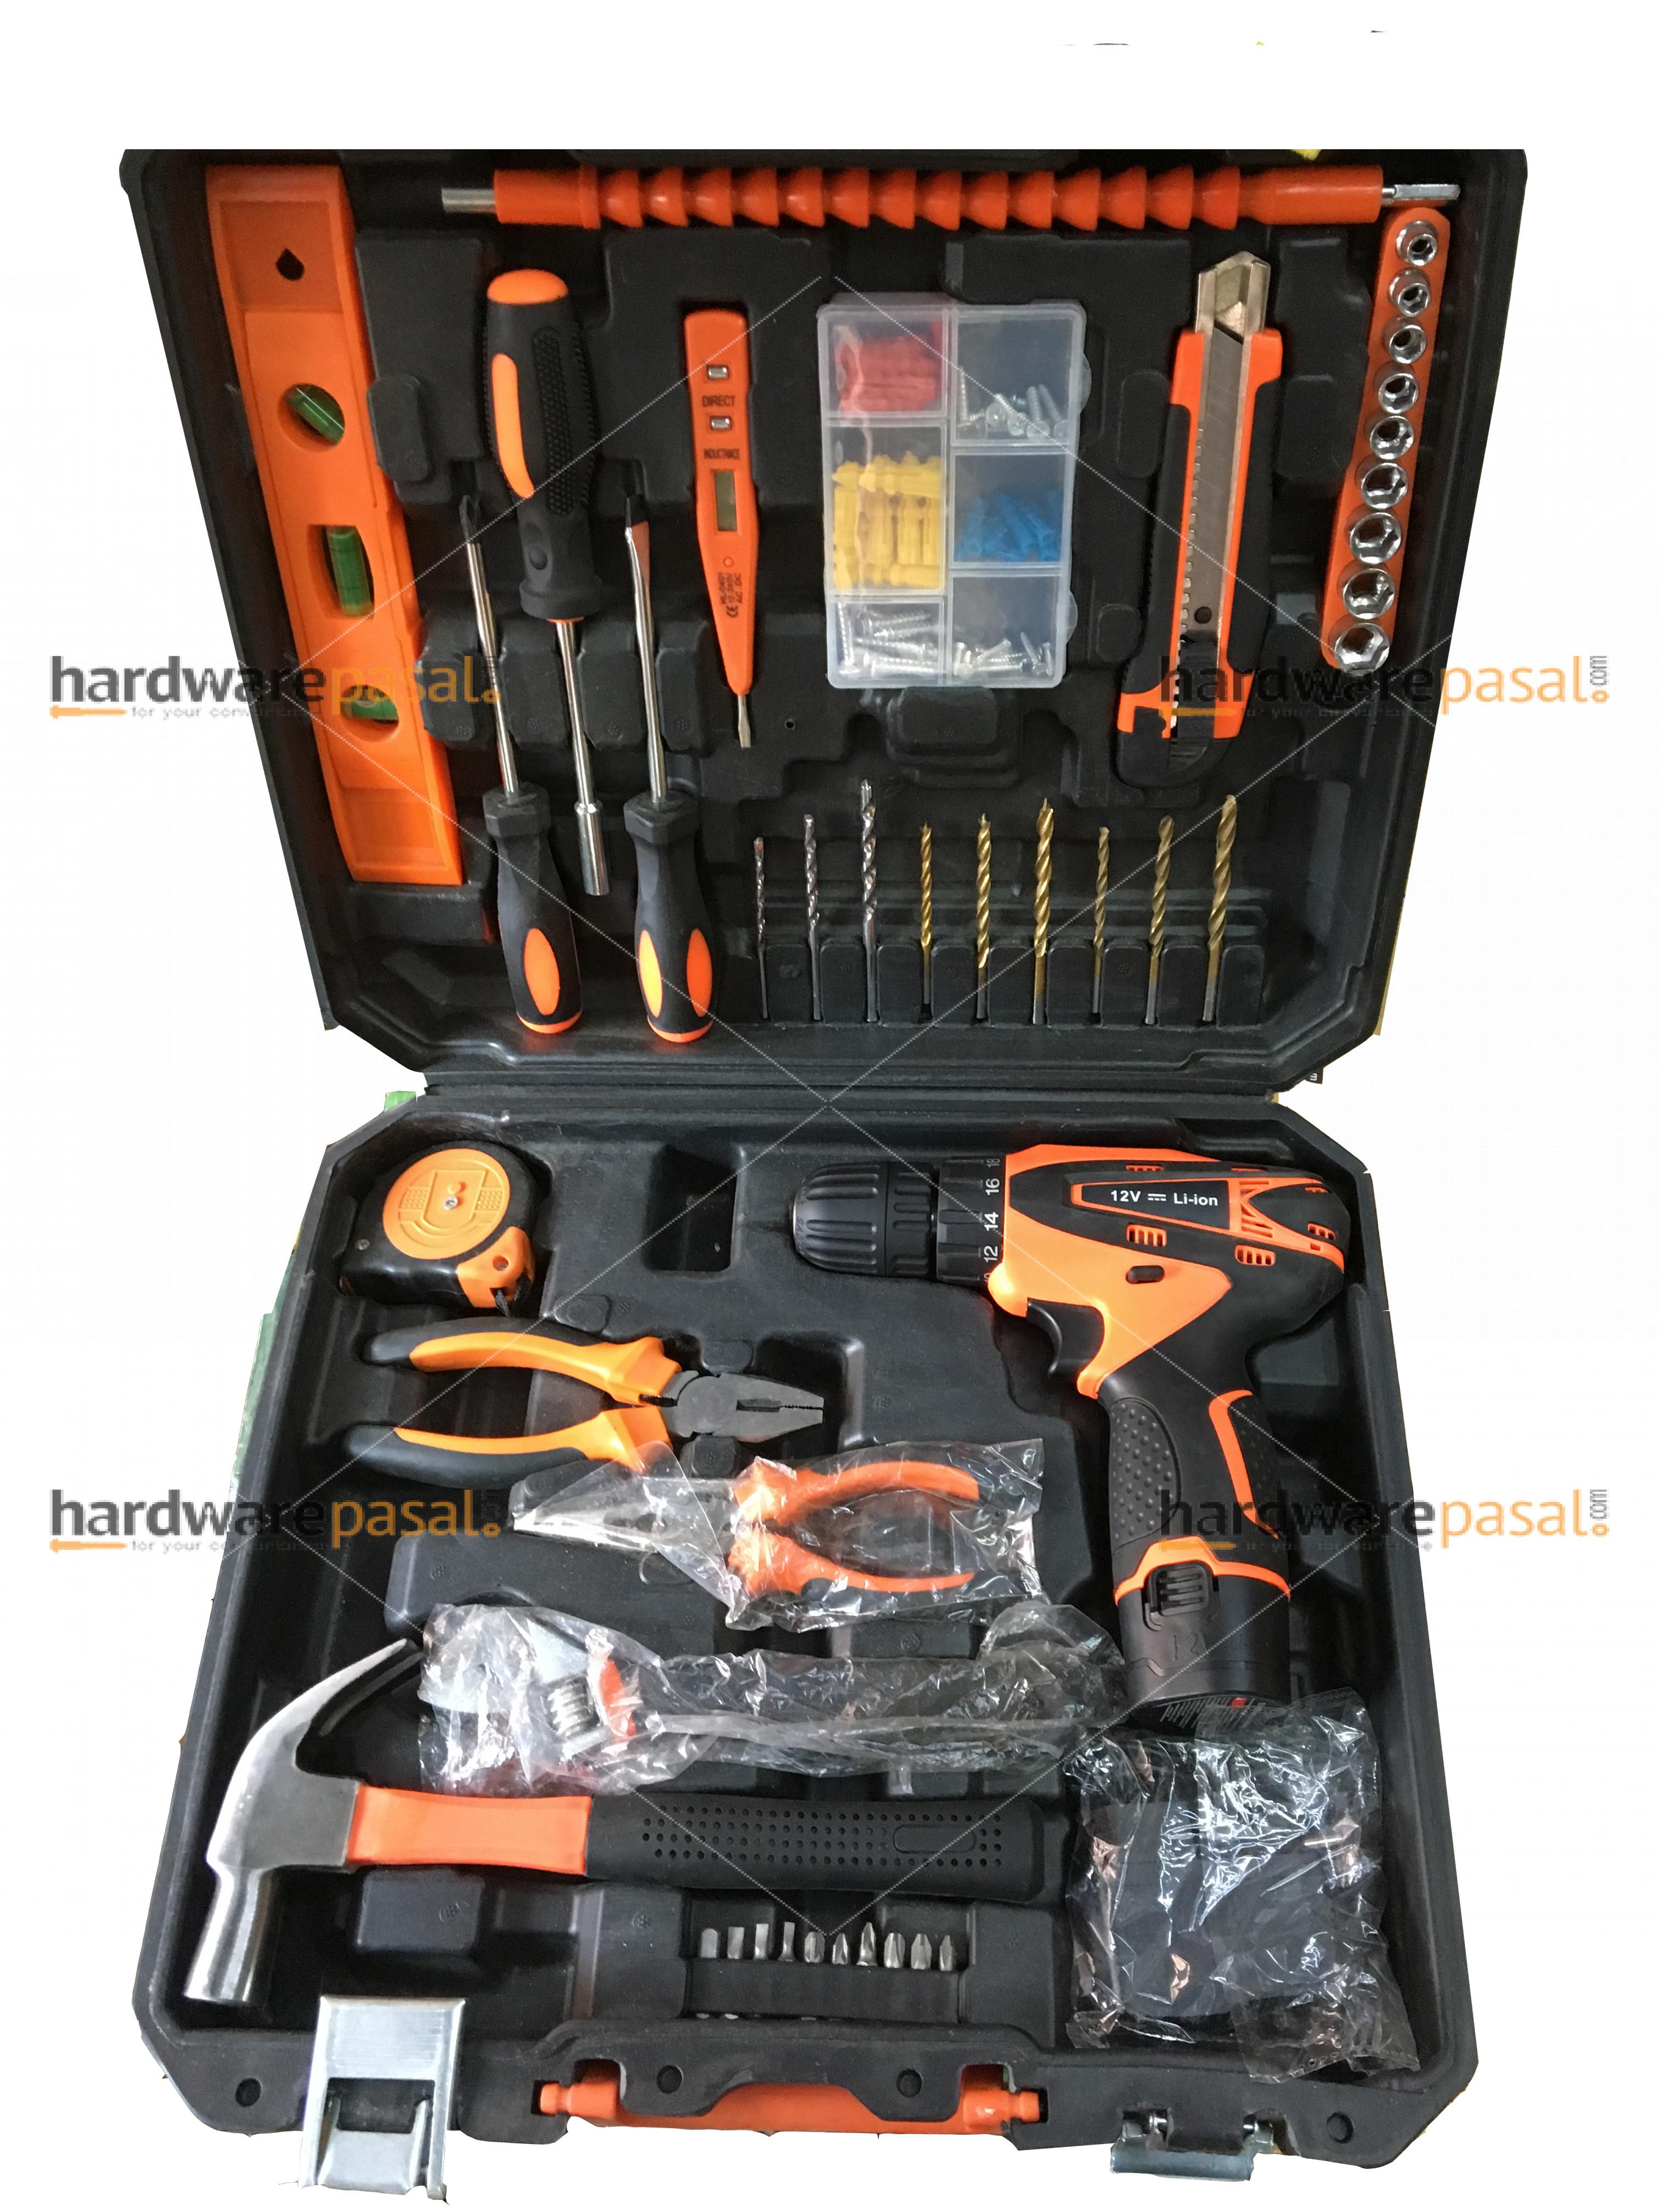 Cordless drill tool set box